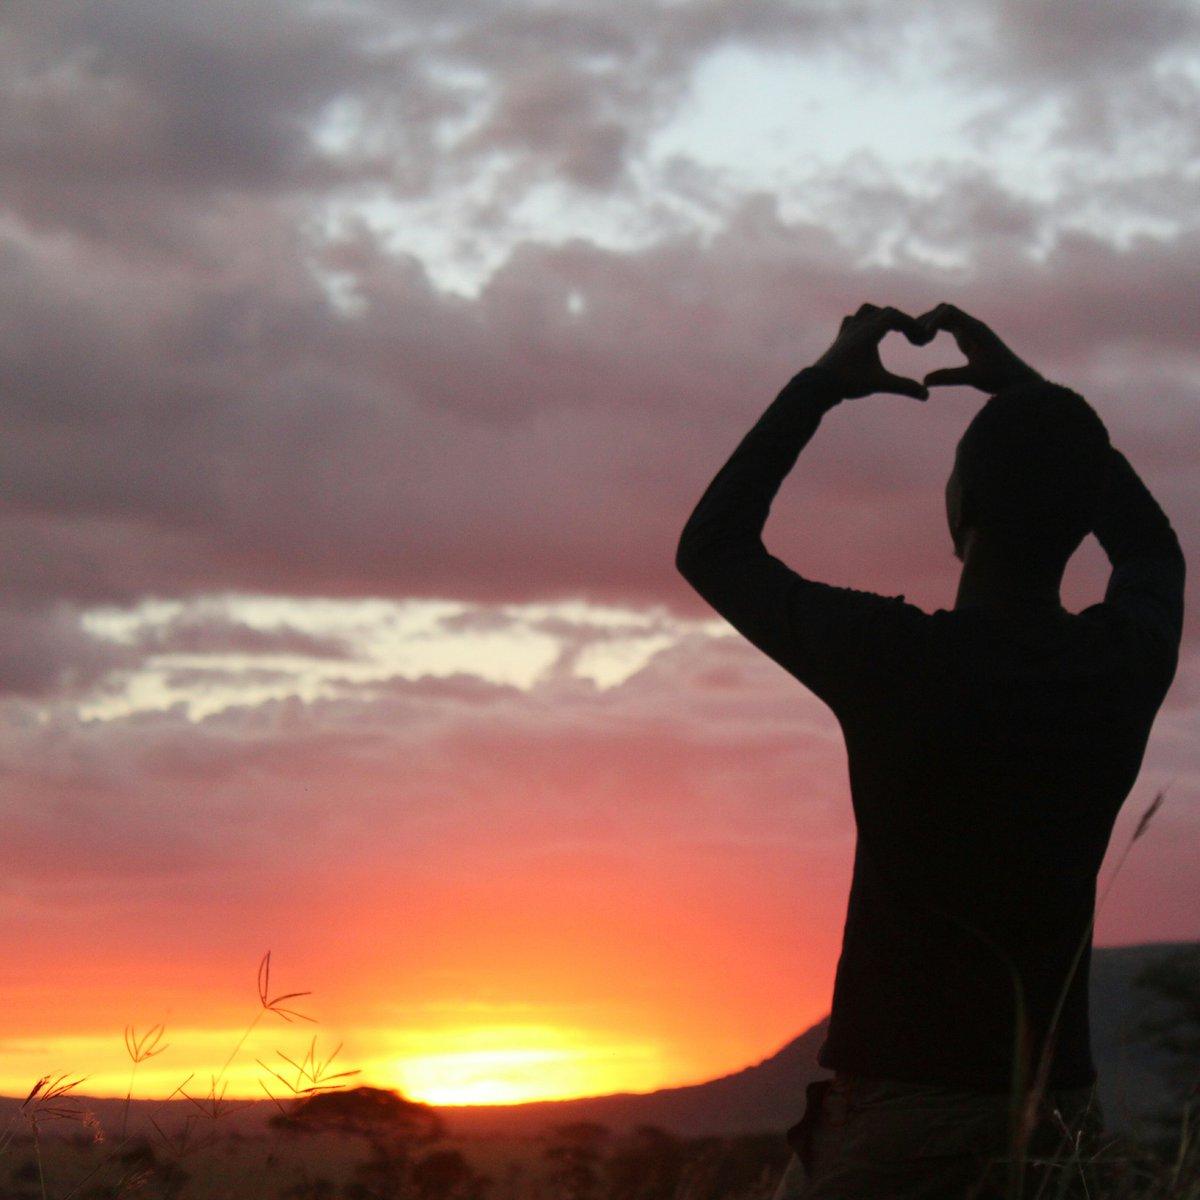 Sun down at Serengeti National Park. Tanzania is ready for you. #KNJ #africanamazing #bucketlist #cytraveler #unforgettabletz #tanapa<br>http://pic.twitter.com/4K6GCWKQo7